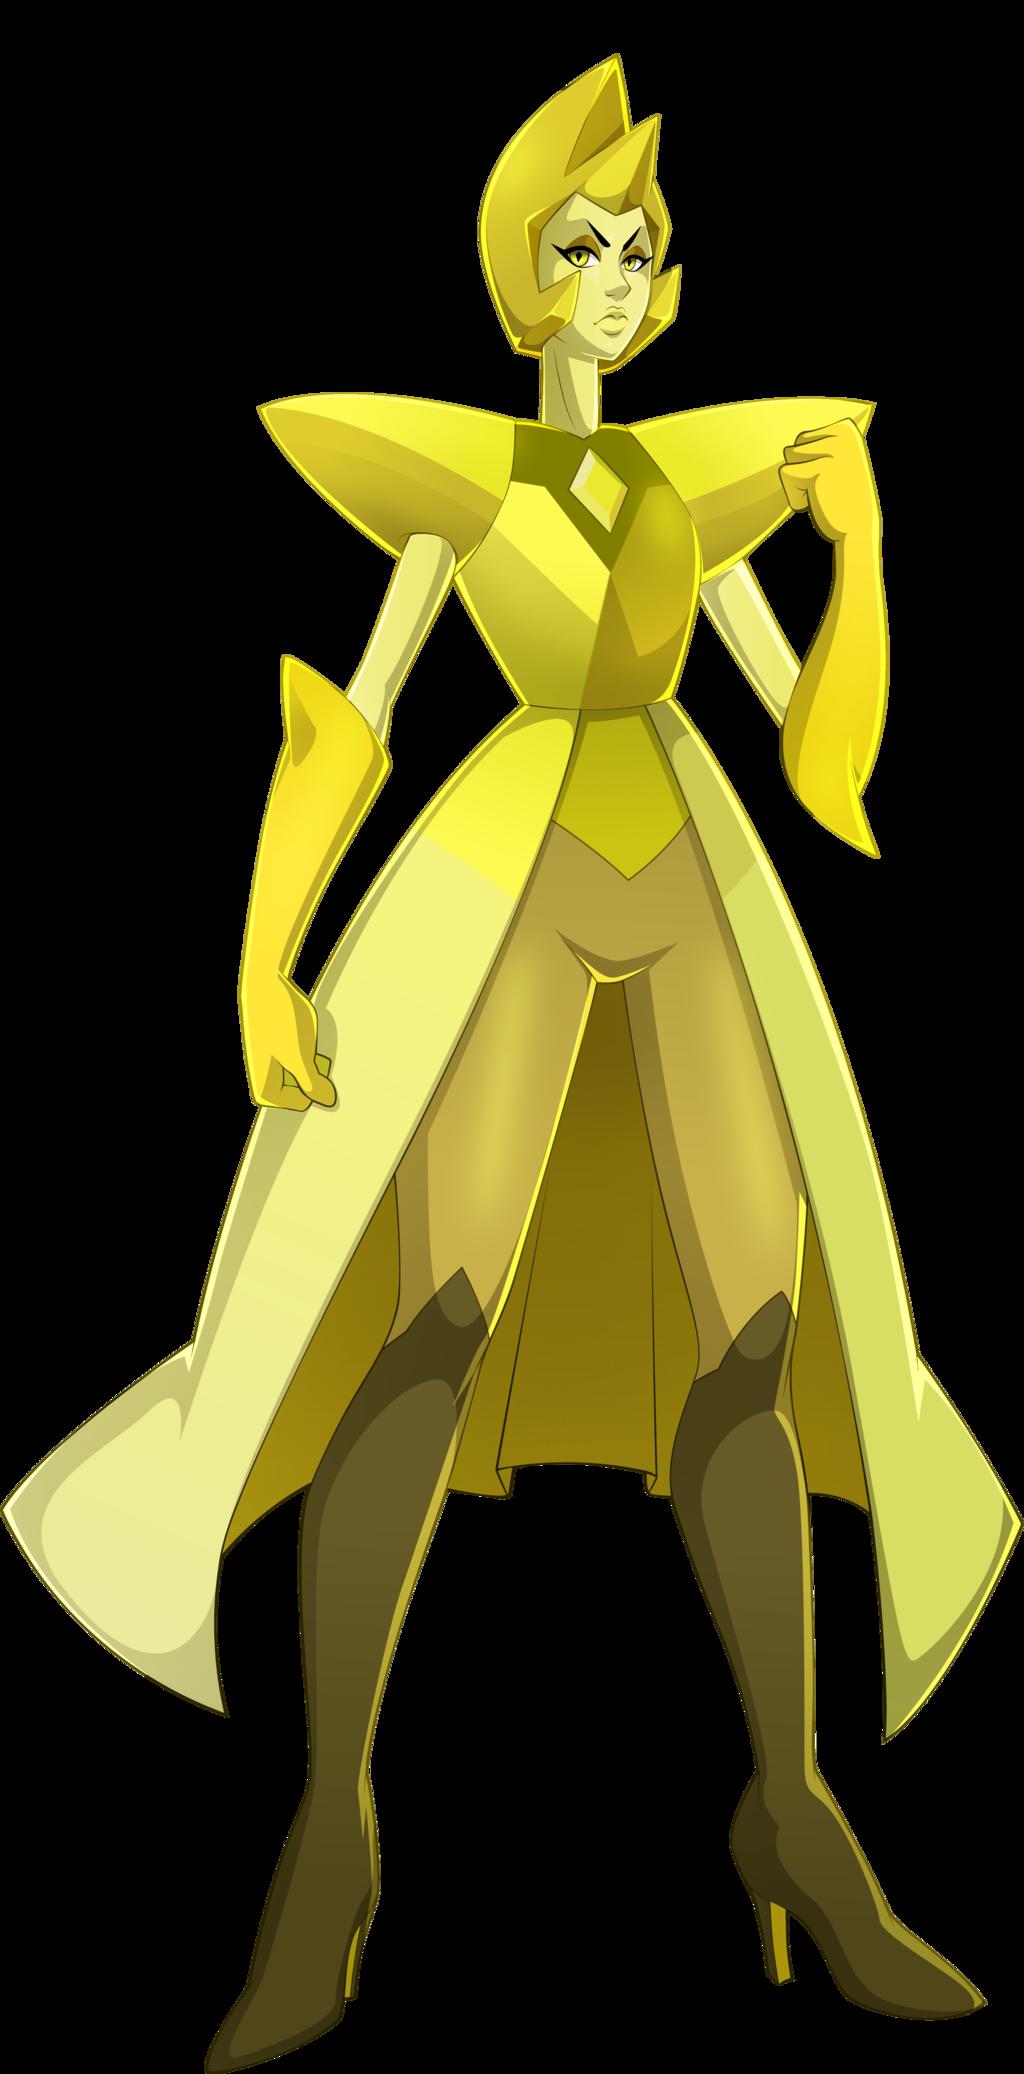 By sparks stars on. Clipart diamond yellow diamond